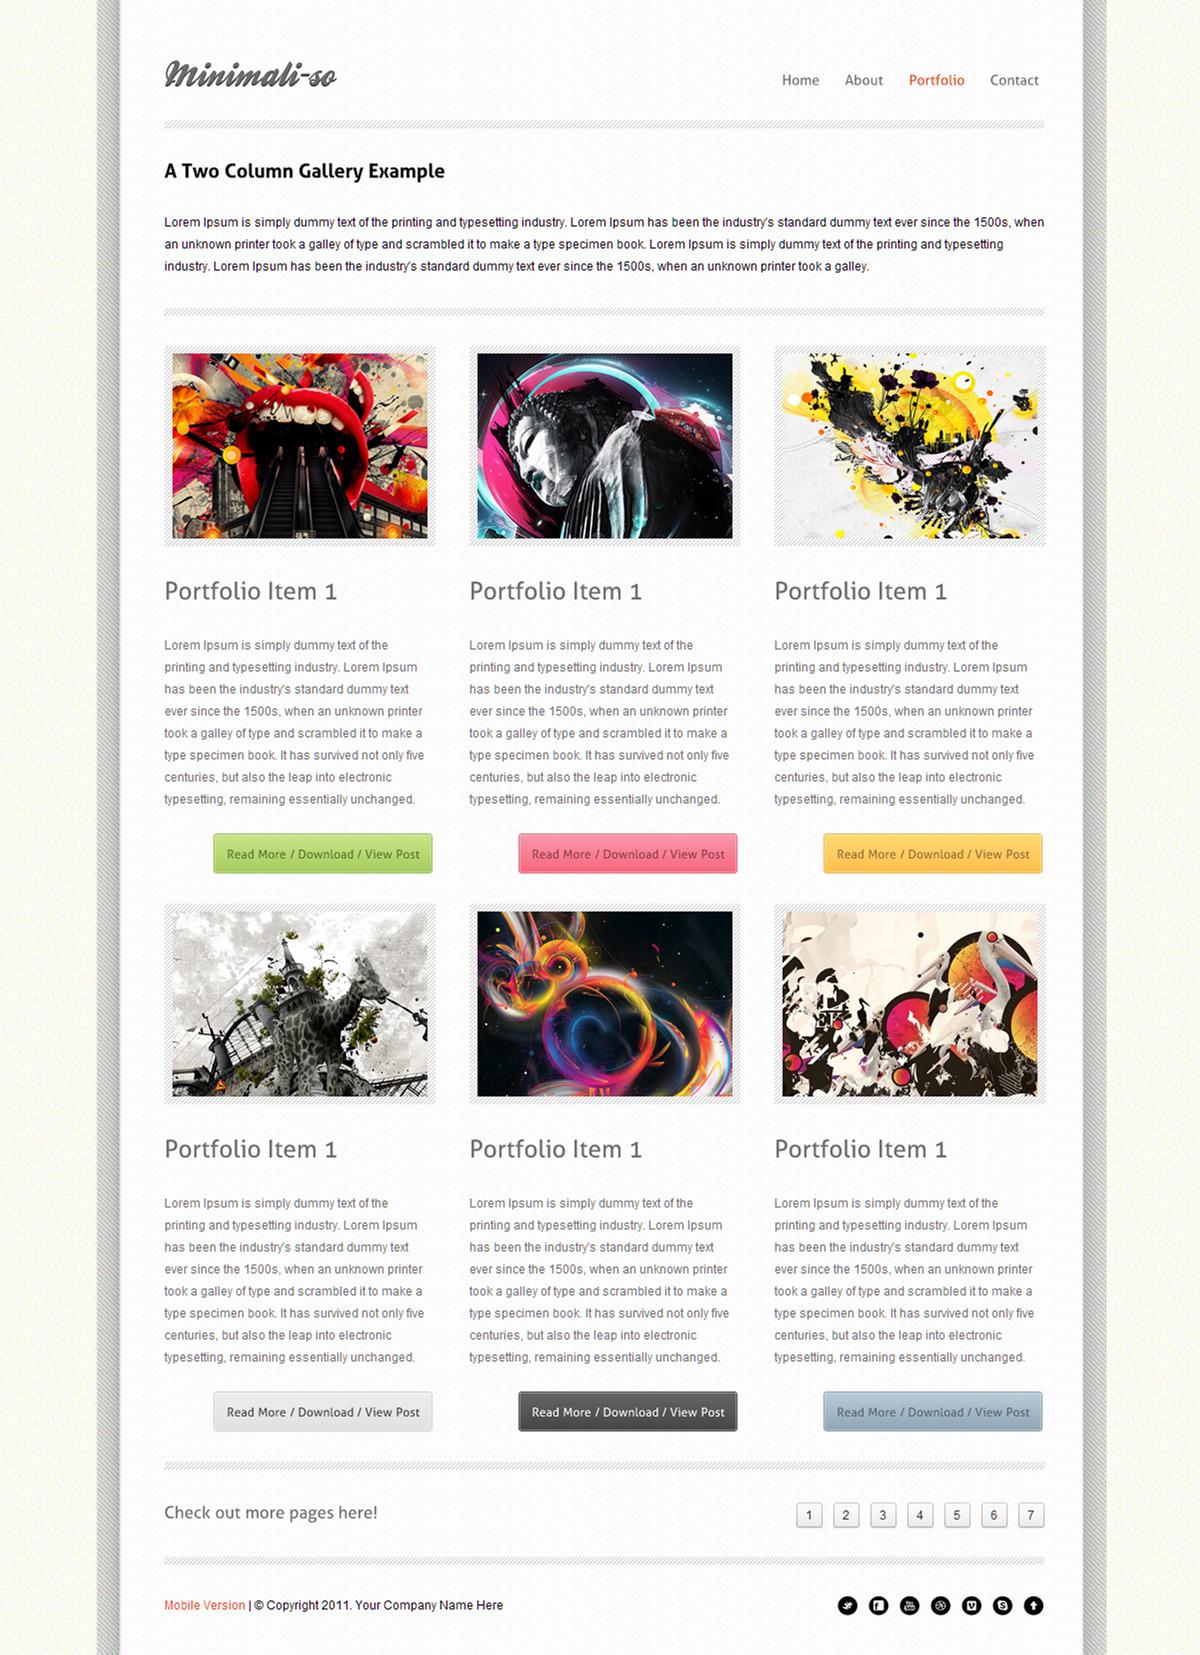 Minimaliso | HTML5 & CSS3 With iPhone WebApp